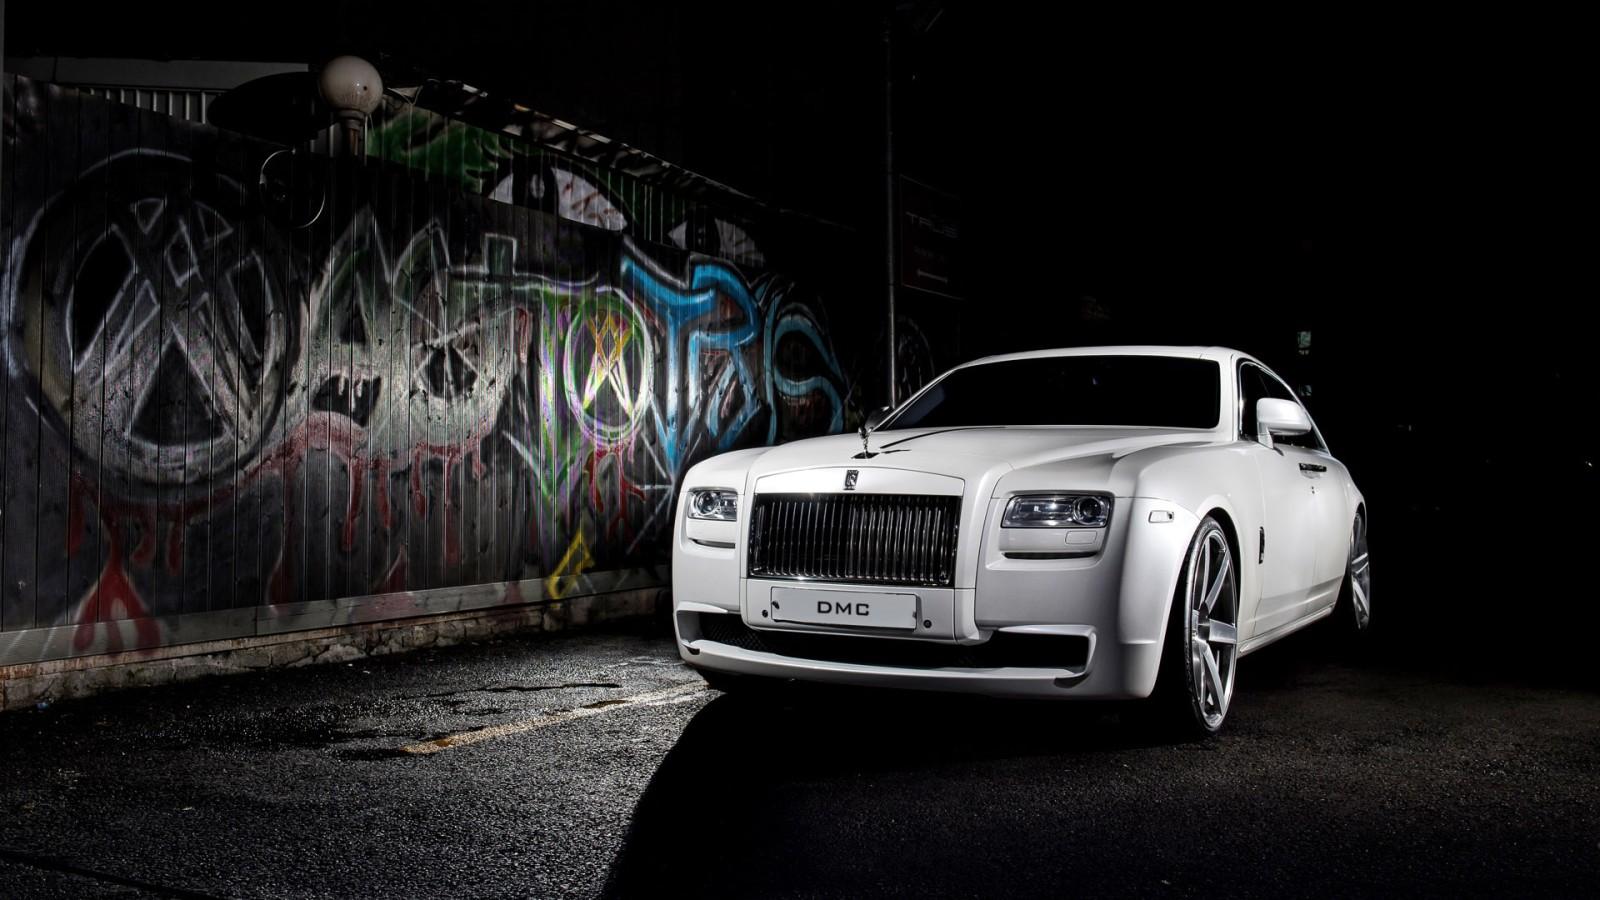 Dope Wallpaper Super Cars 2016 Dmc Rolls Royce Ghost Saranghae 2 Wallpaper Hd Car